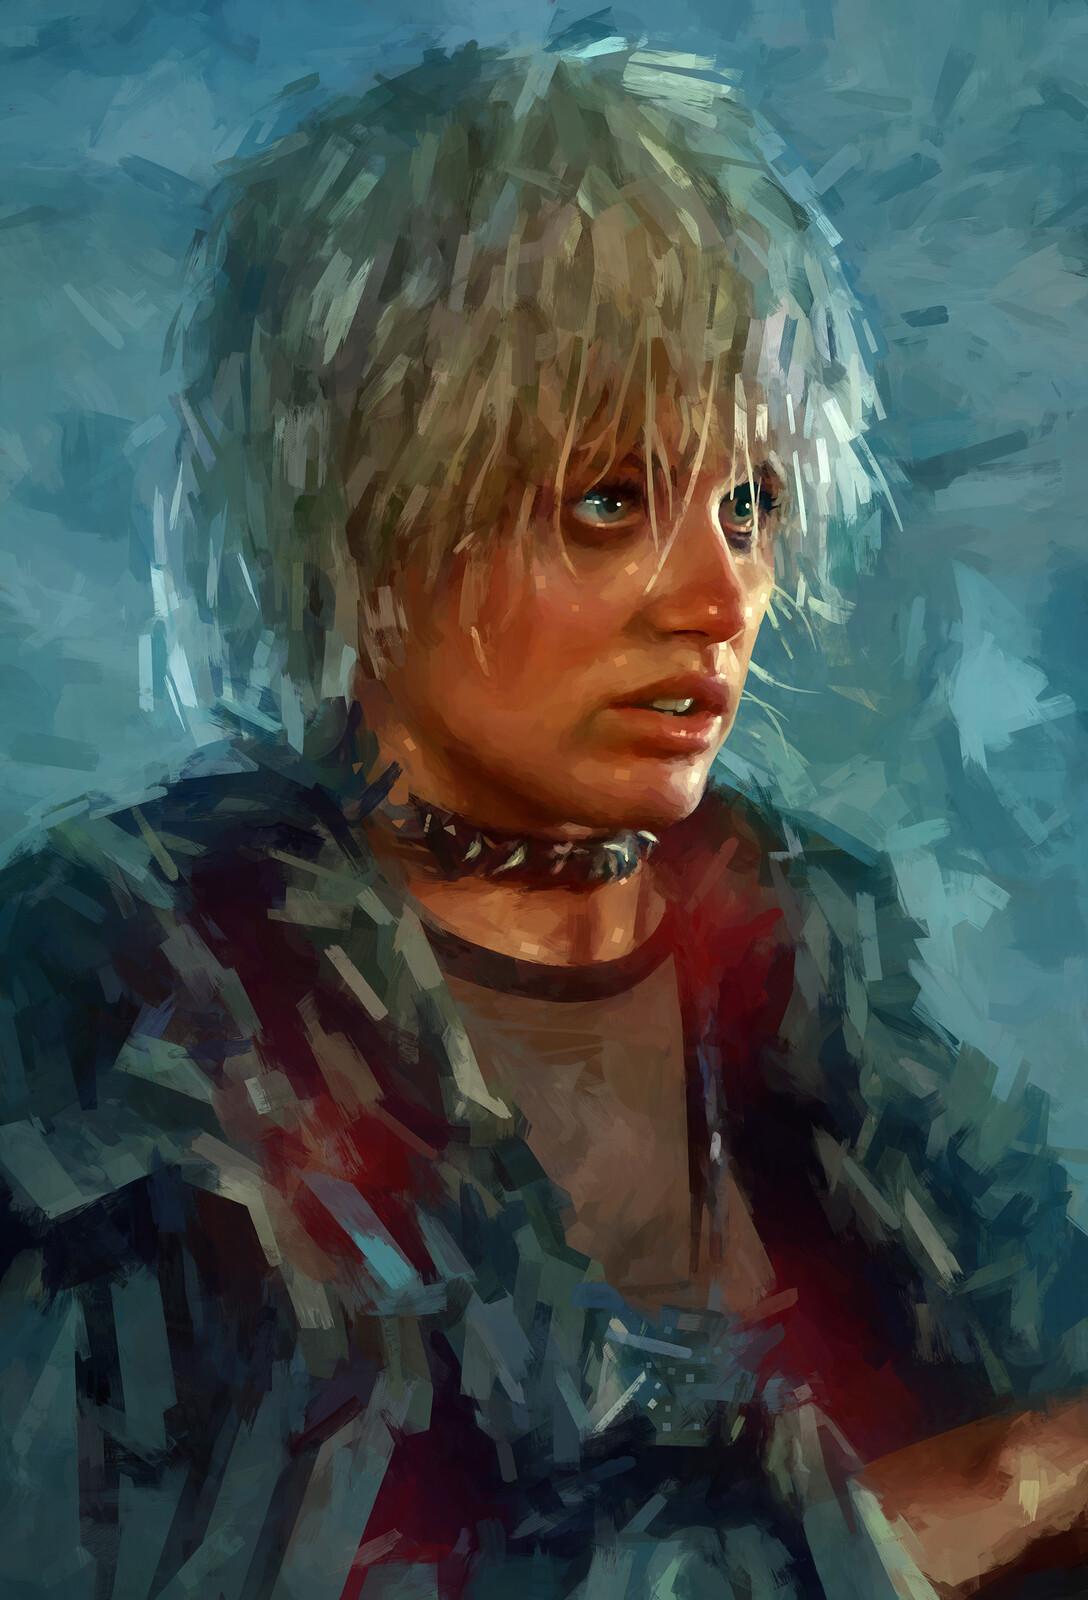 Pris (Blade Runner)